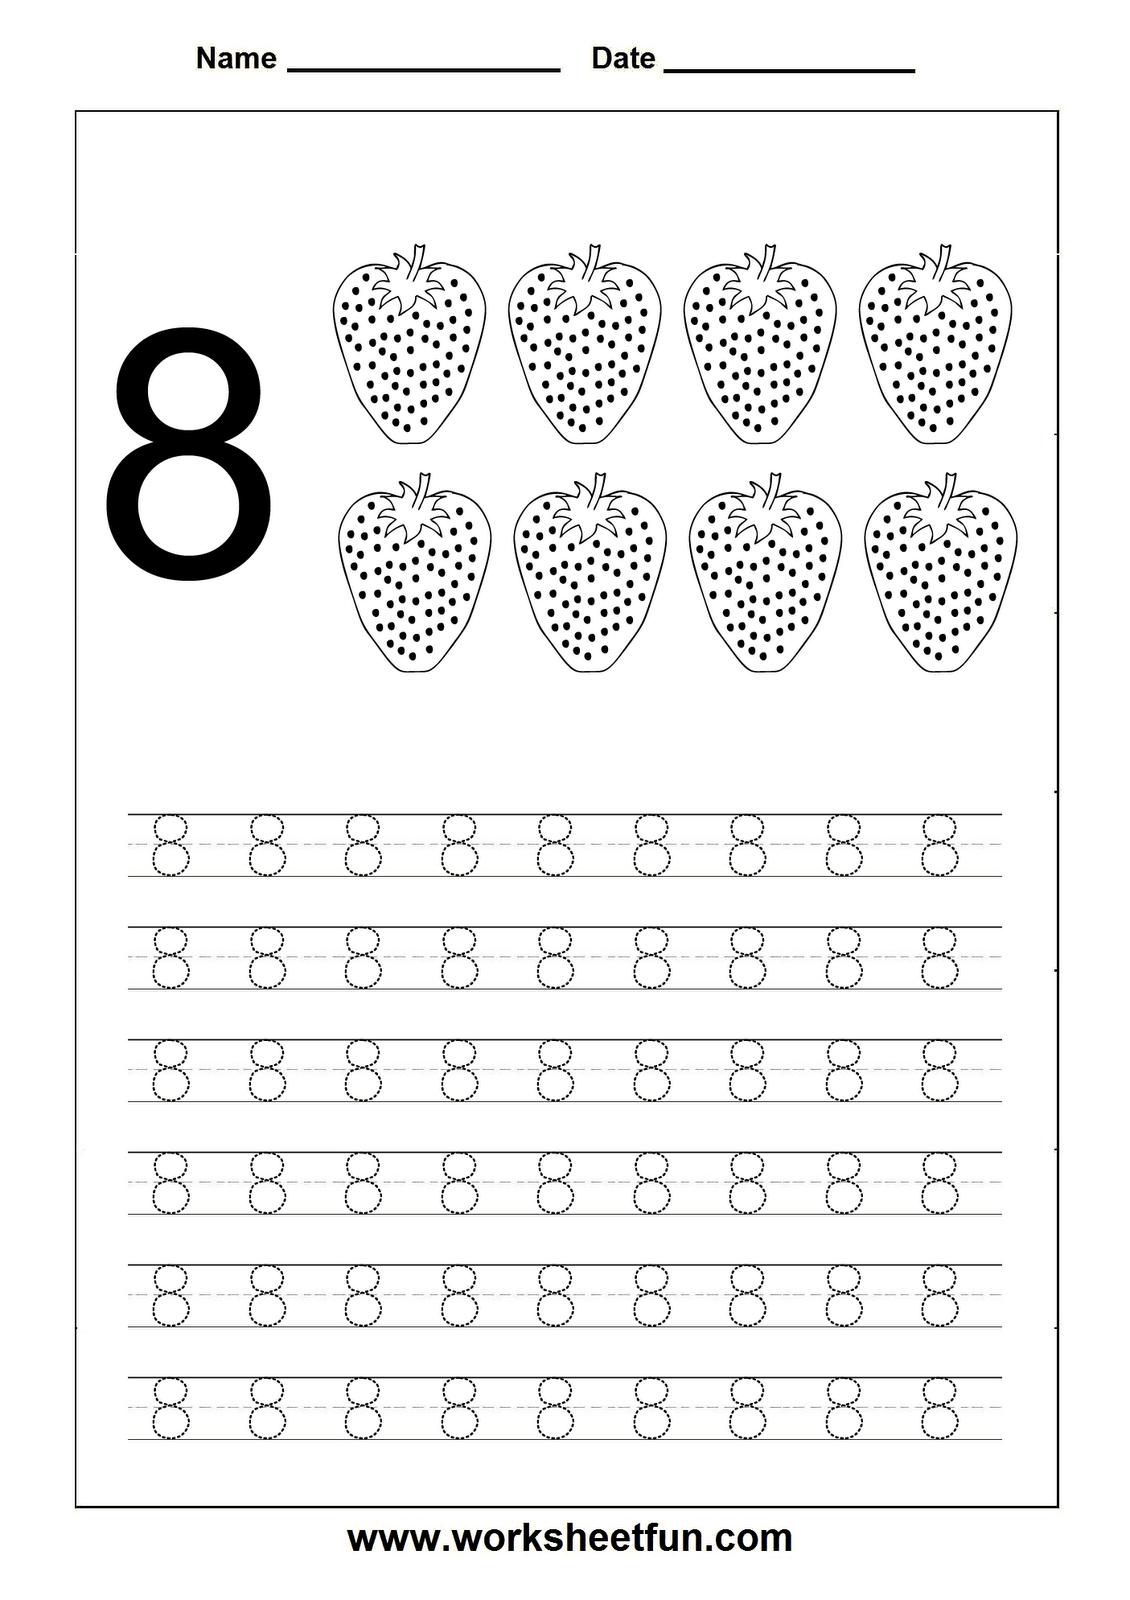 Number Tracing worksheet - 8 | Homeschooling: Number Tracing ...